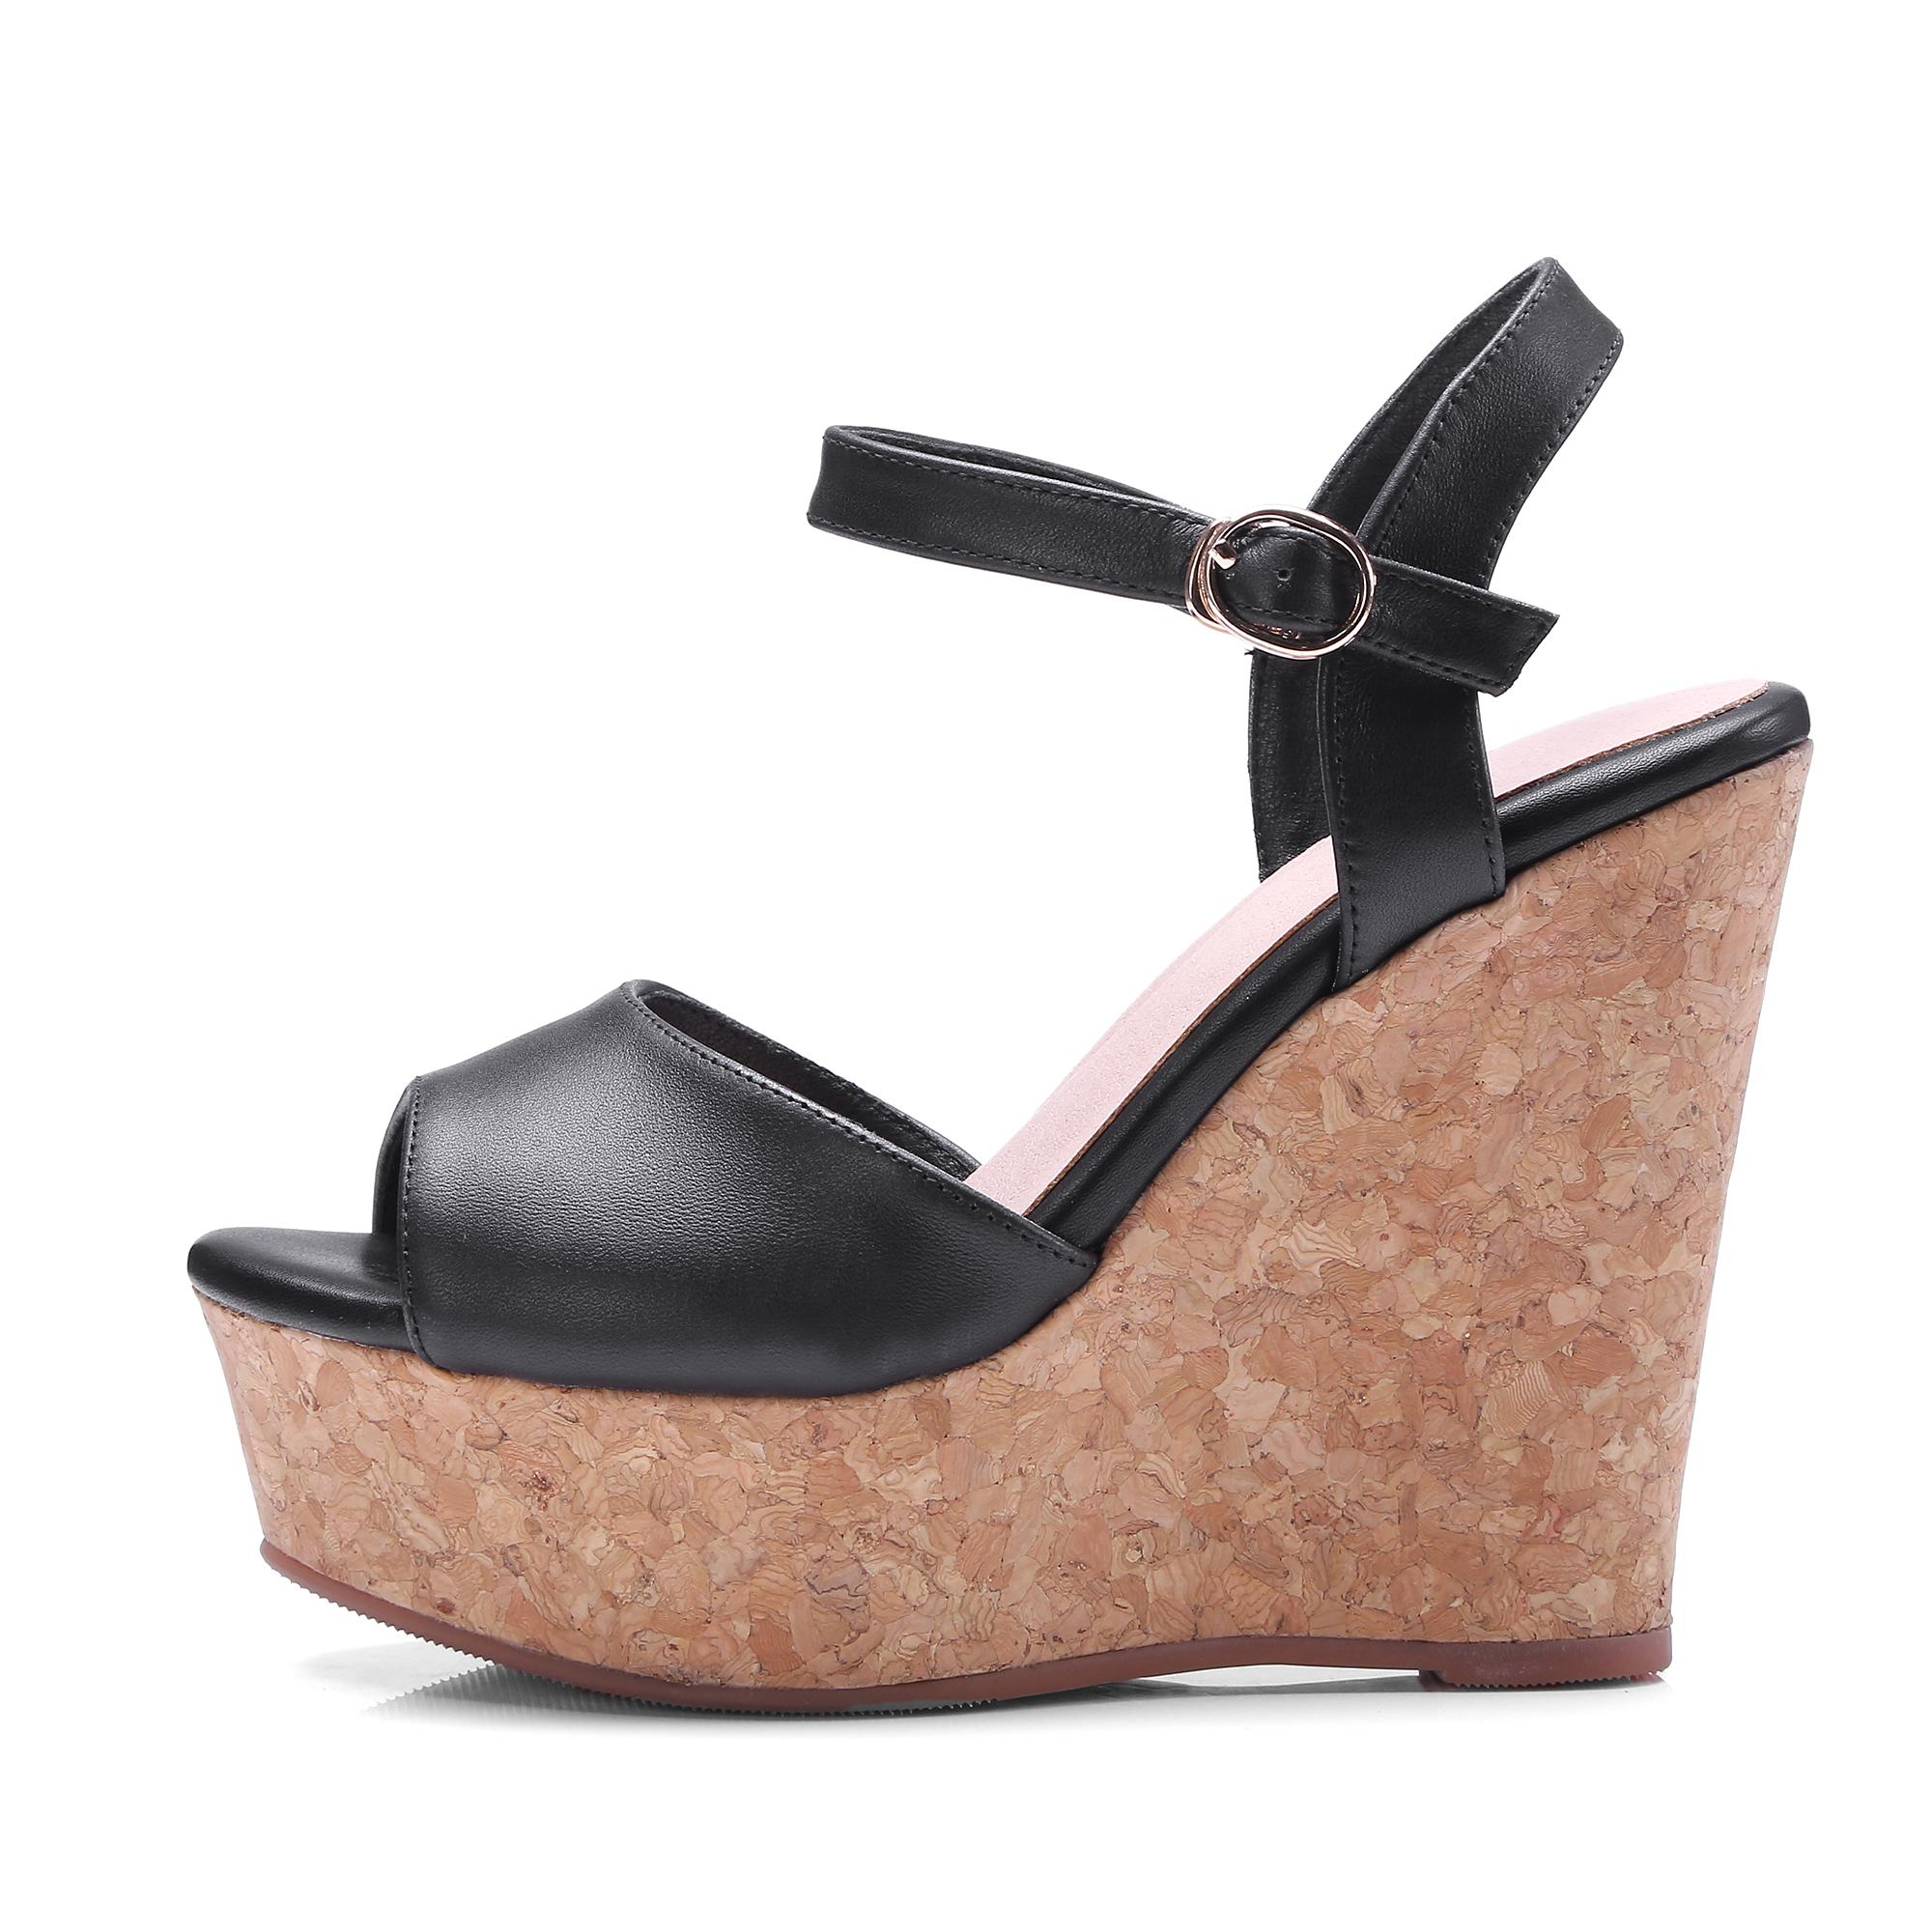 94bd1abab US  60 - Arden Furtado 2018 summer high heels 12cm fashion genuine leather platform  wedges ladies green sandals peep toe shoes ladies - www.ardenfurtado.com